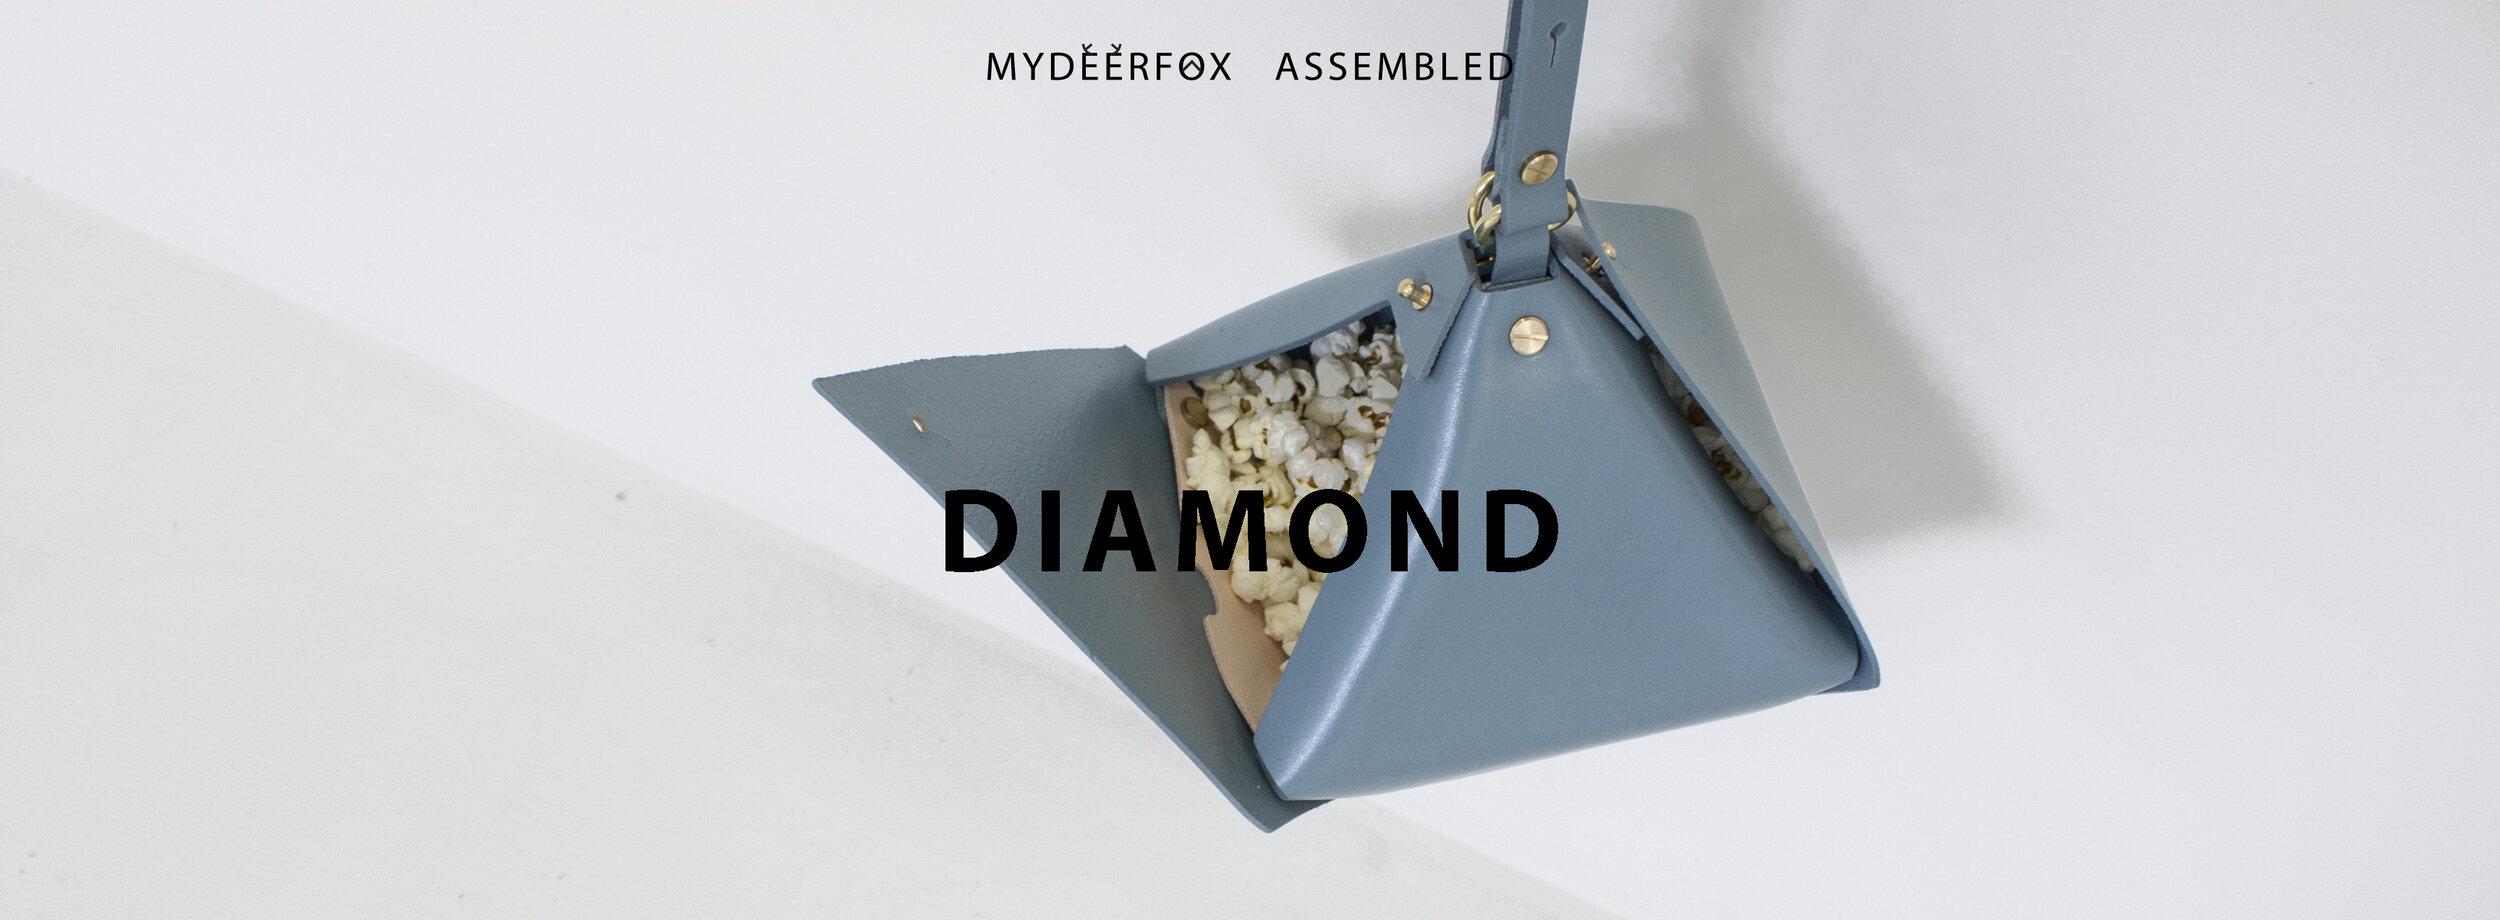 MYDEERFOX_DIAMOND_BAG_ASSEMBLED